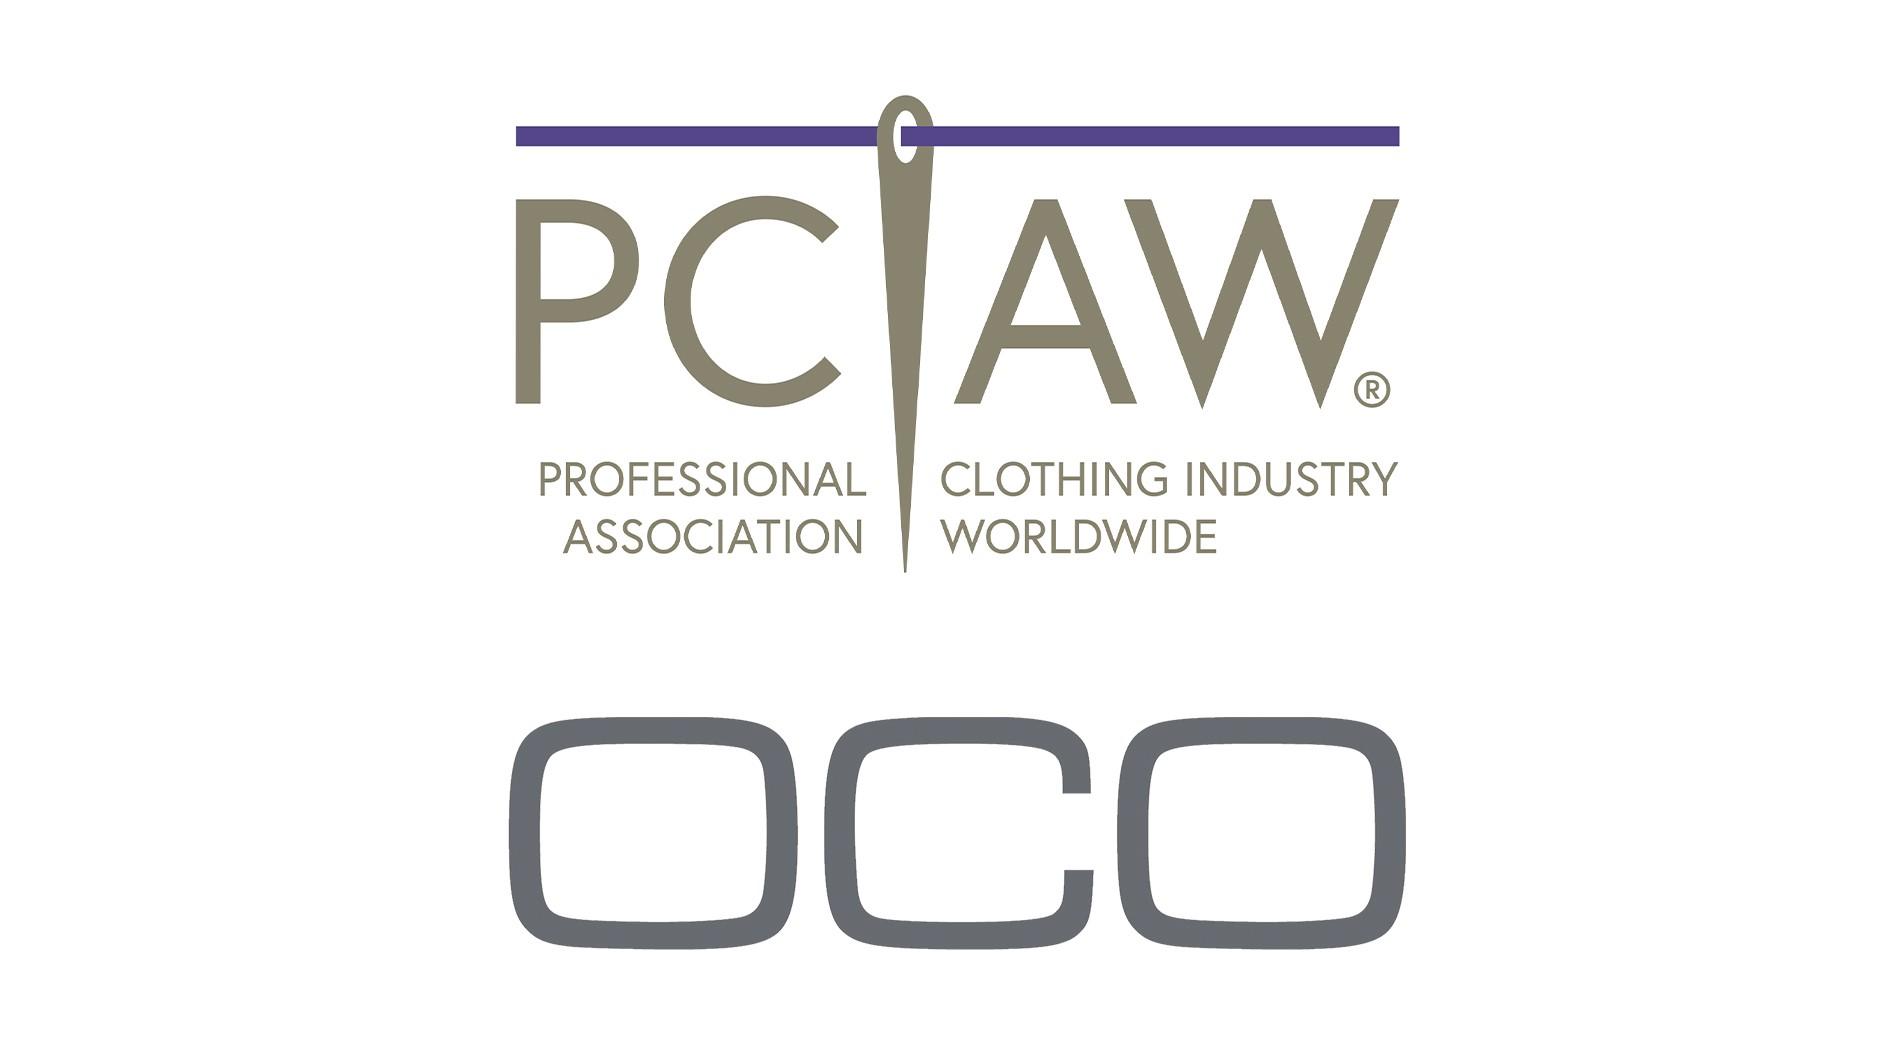 OCO and PCIAW®